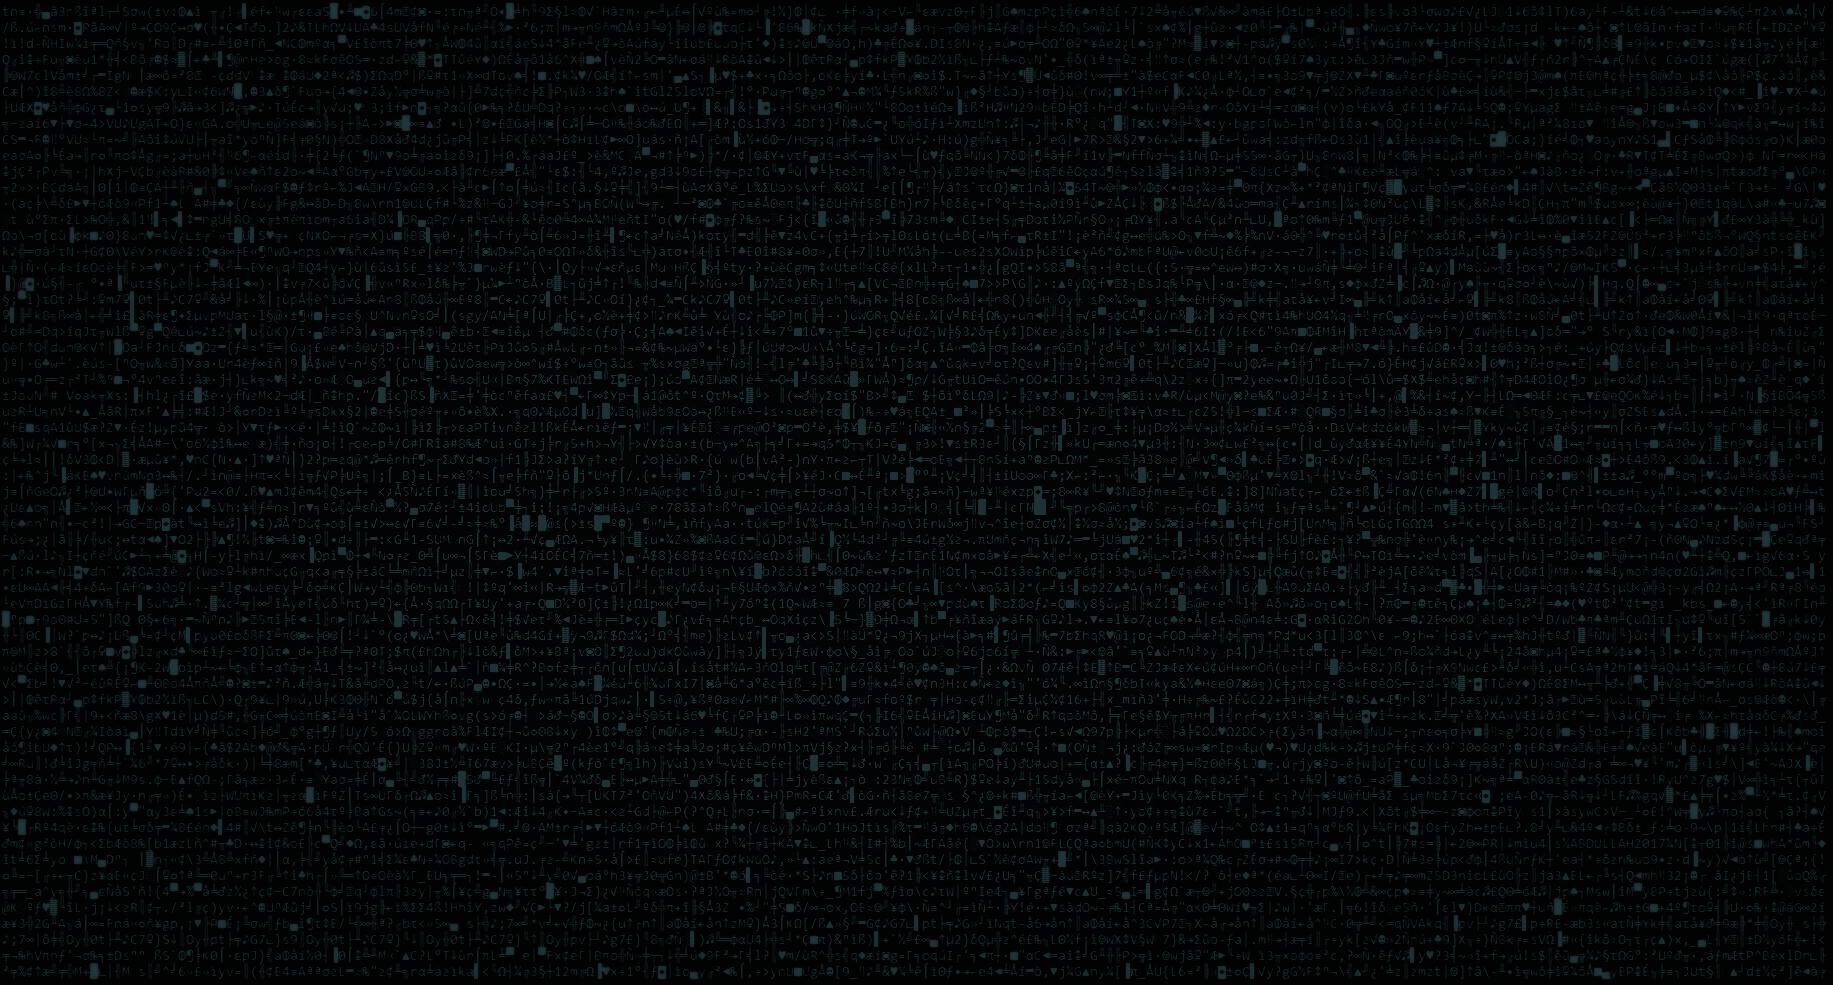 Wallpaper : programmers, hacking, code, minimalism, Retro